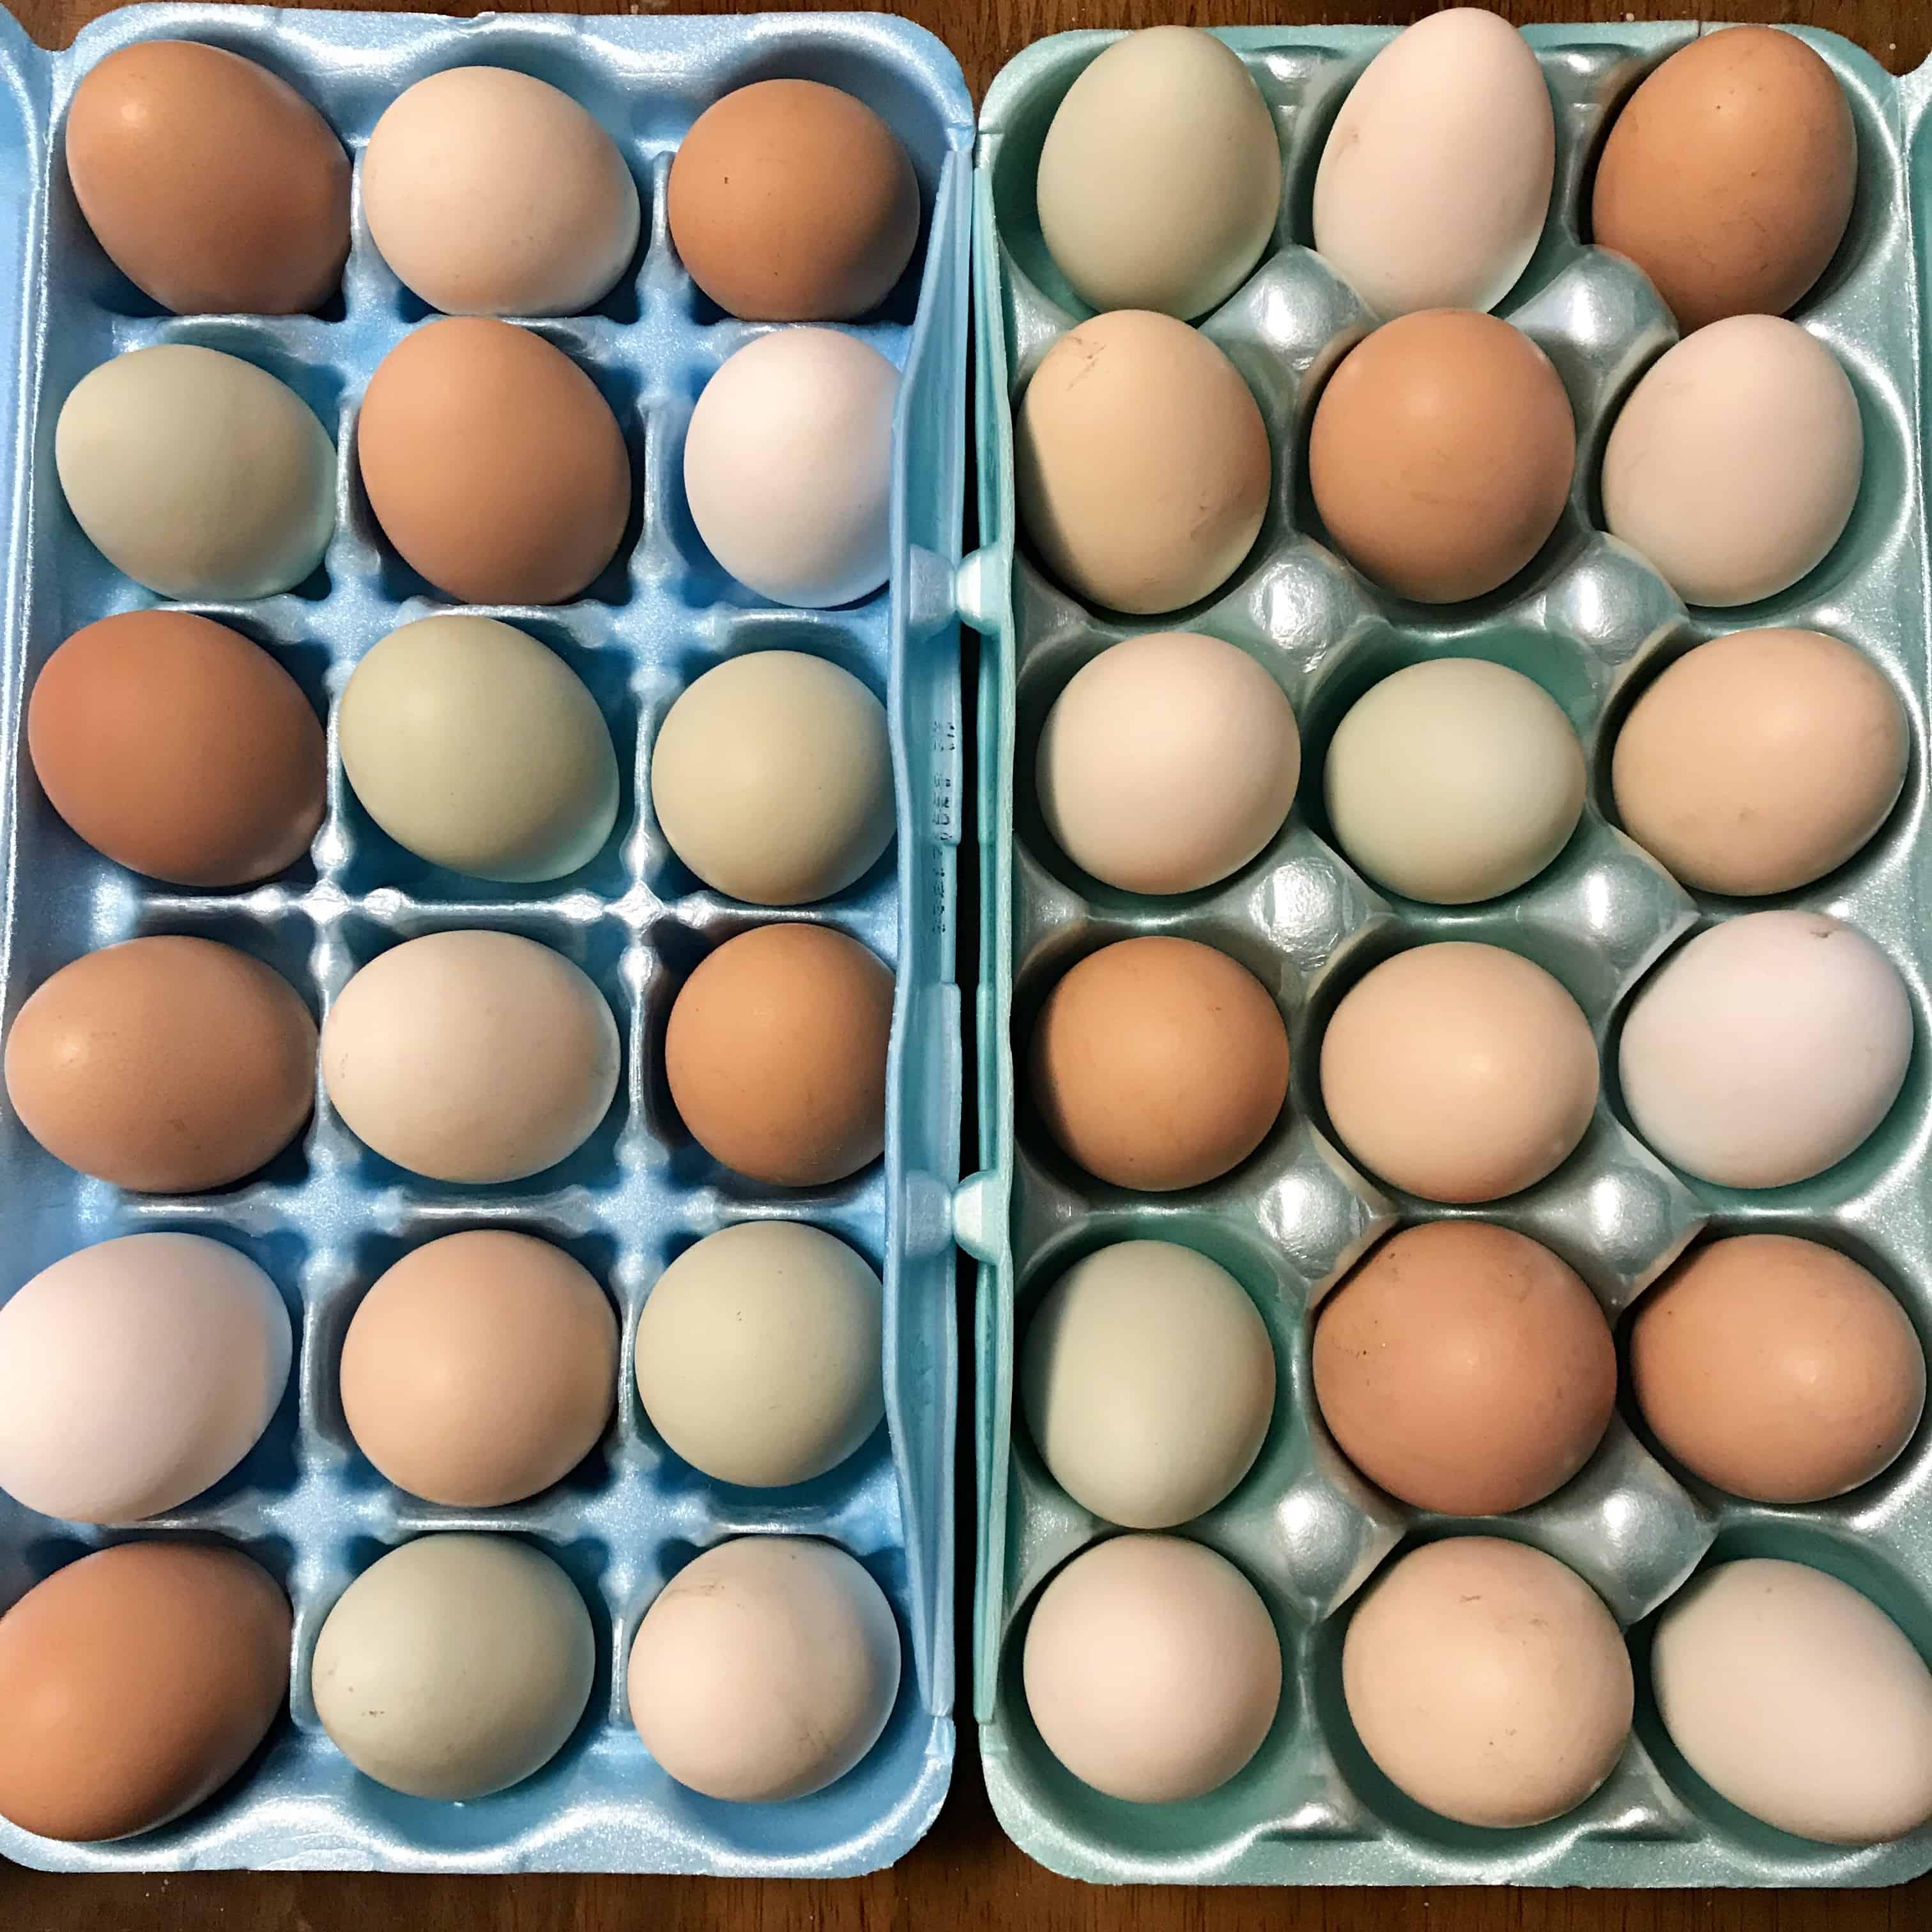 How to Choose an Egg Incubator